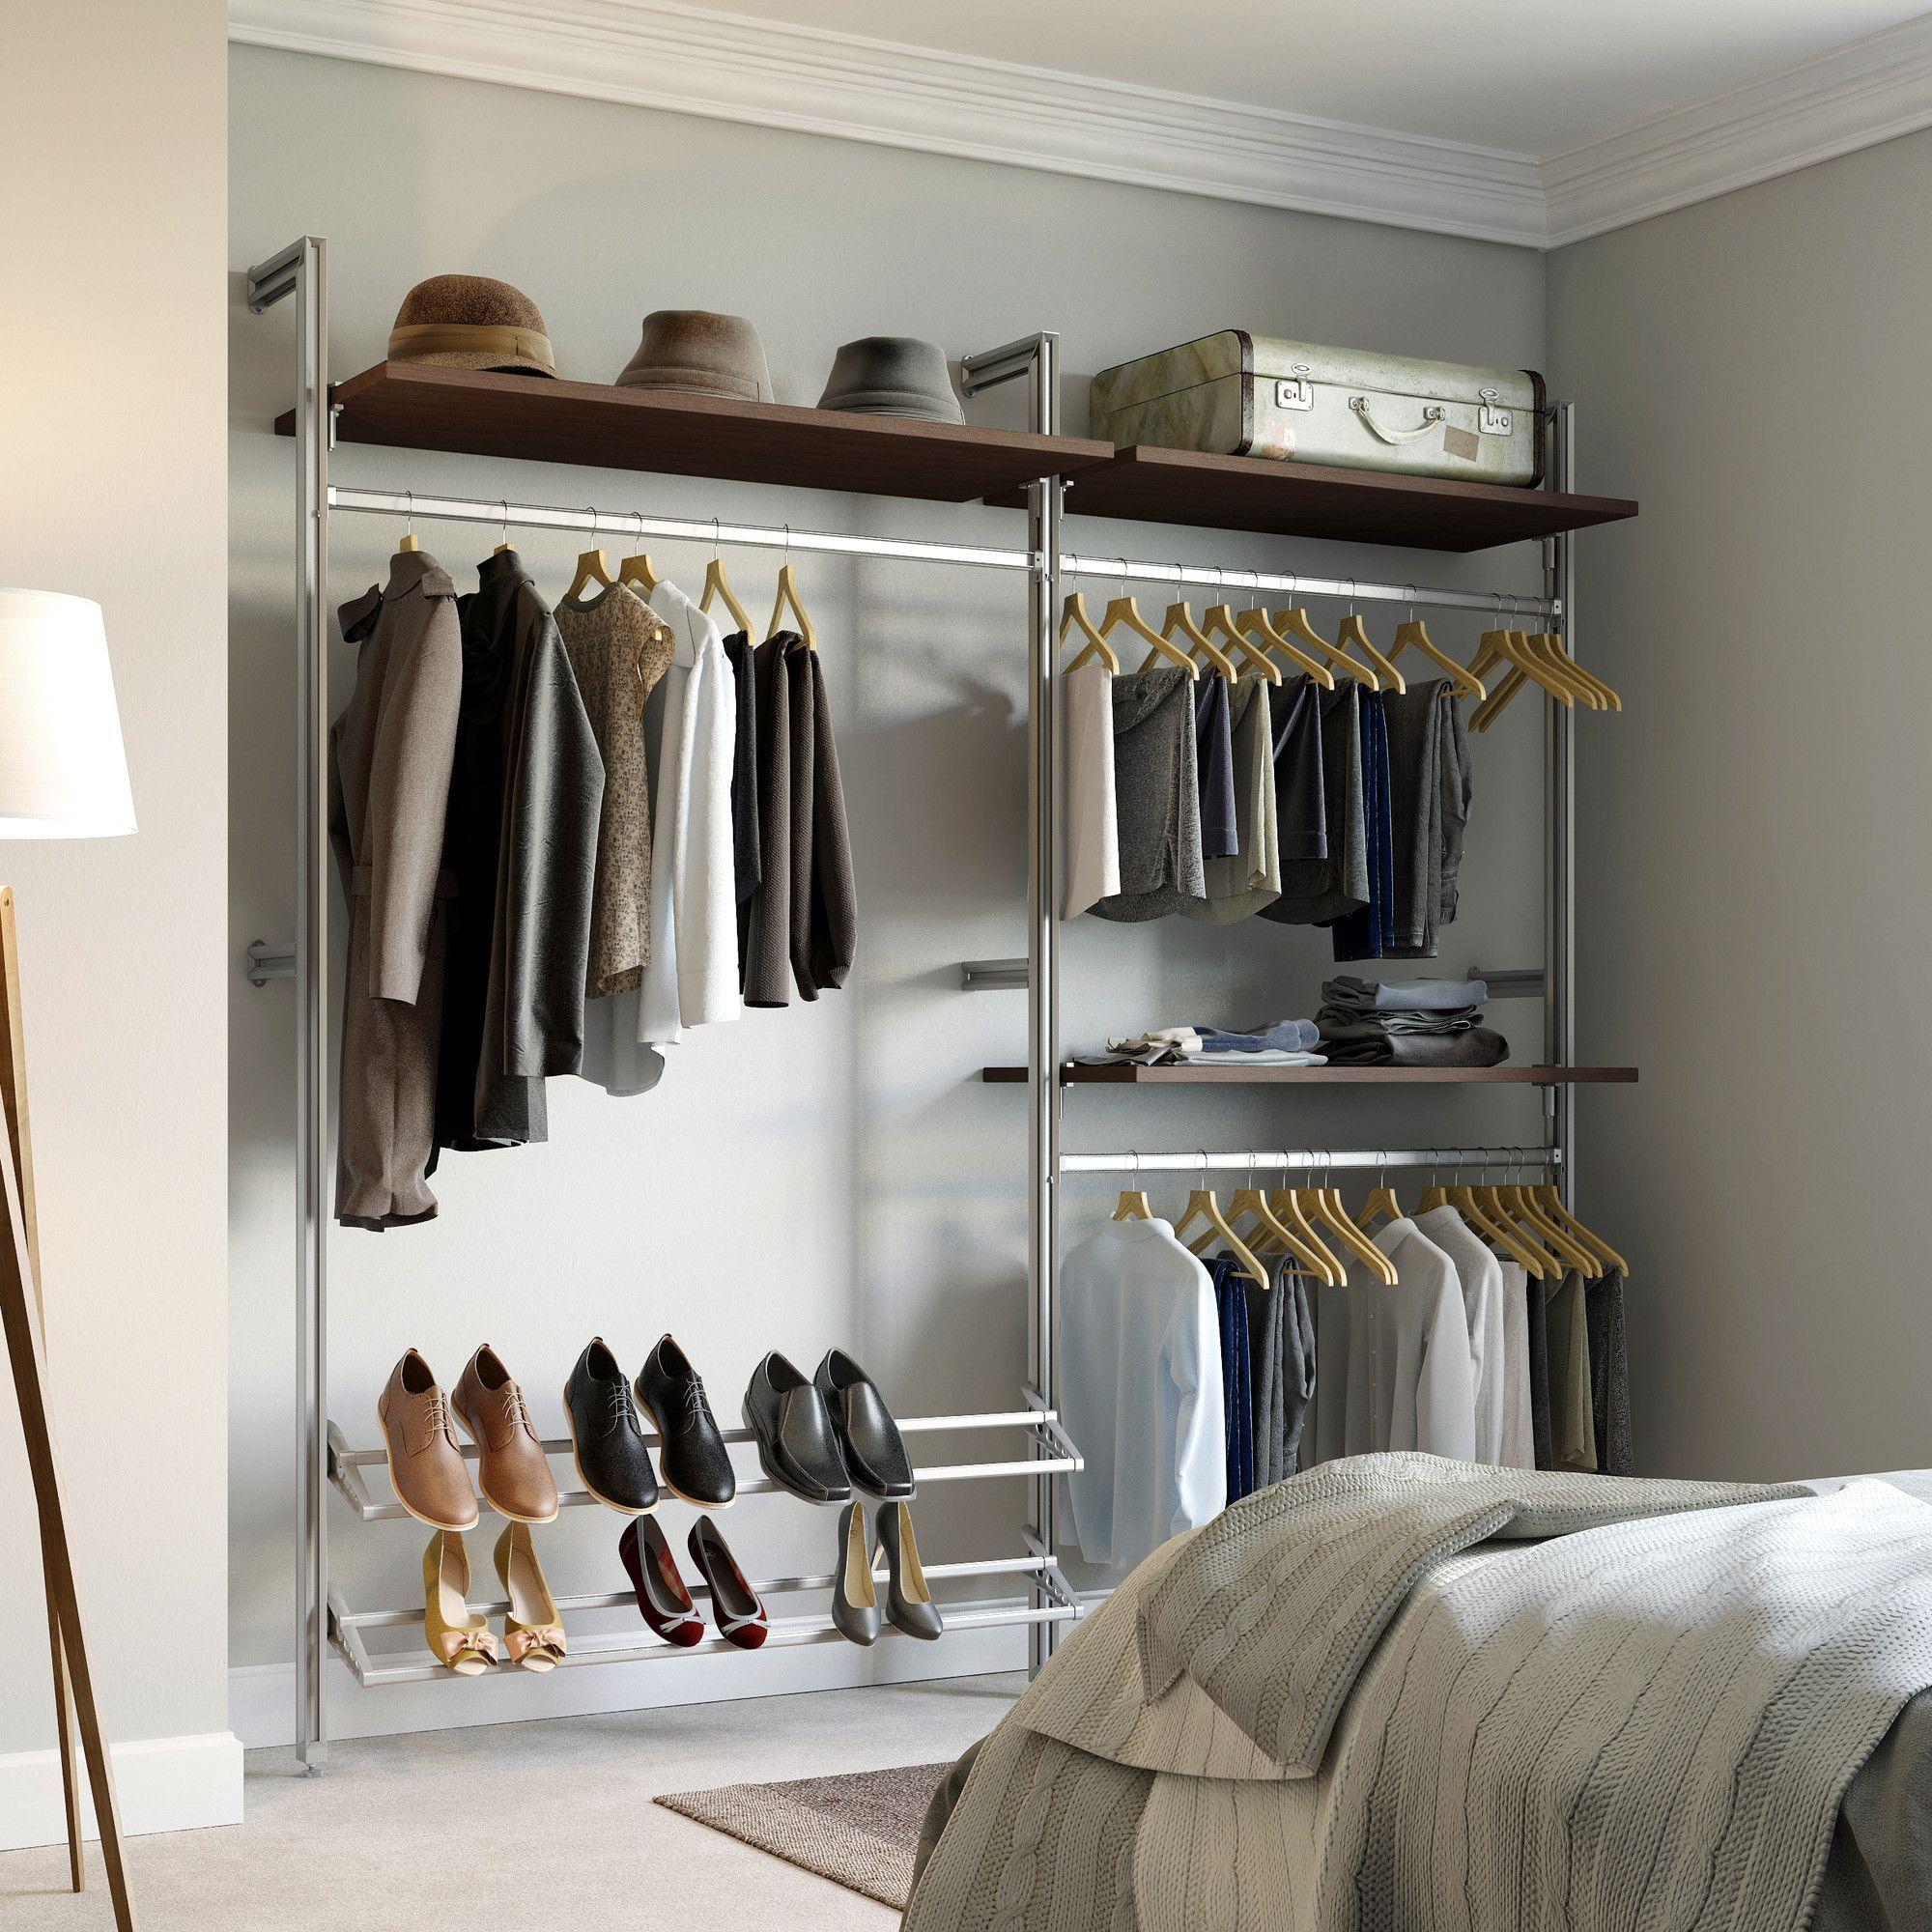 Relax 7.33 ft. Intermediate Closet Kit Closet system